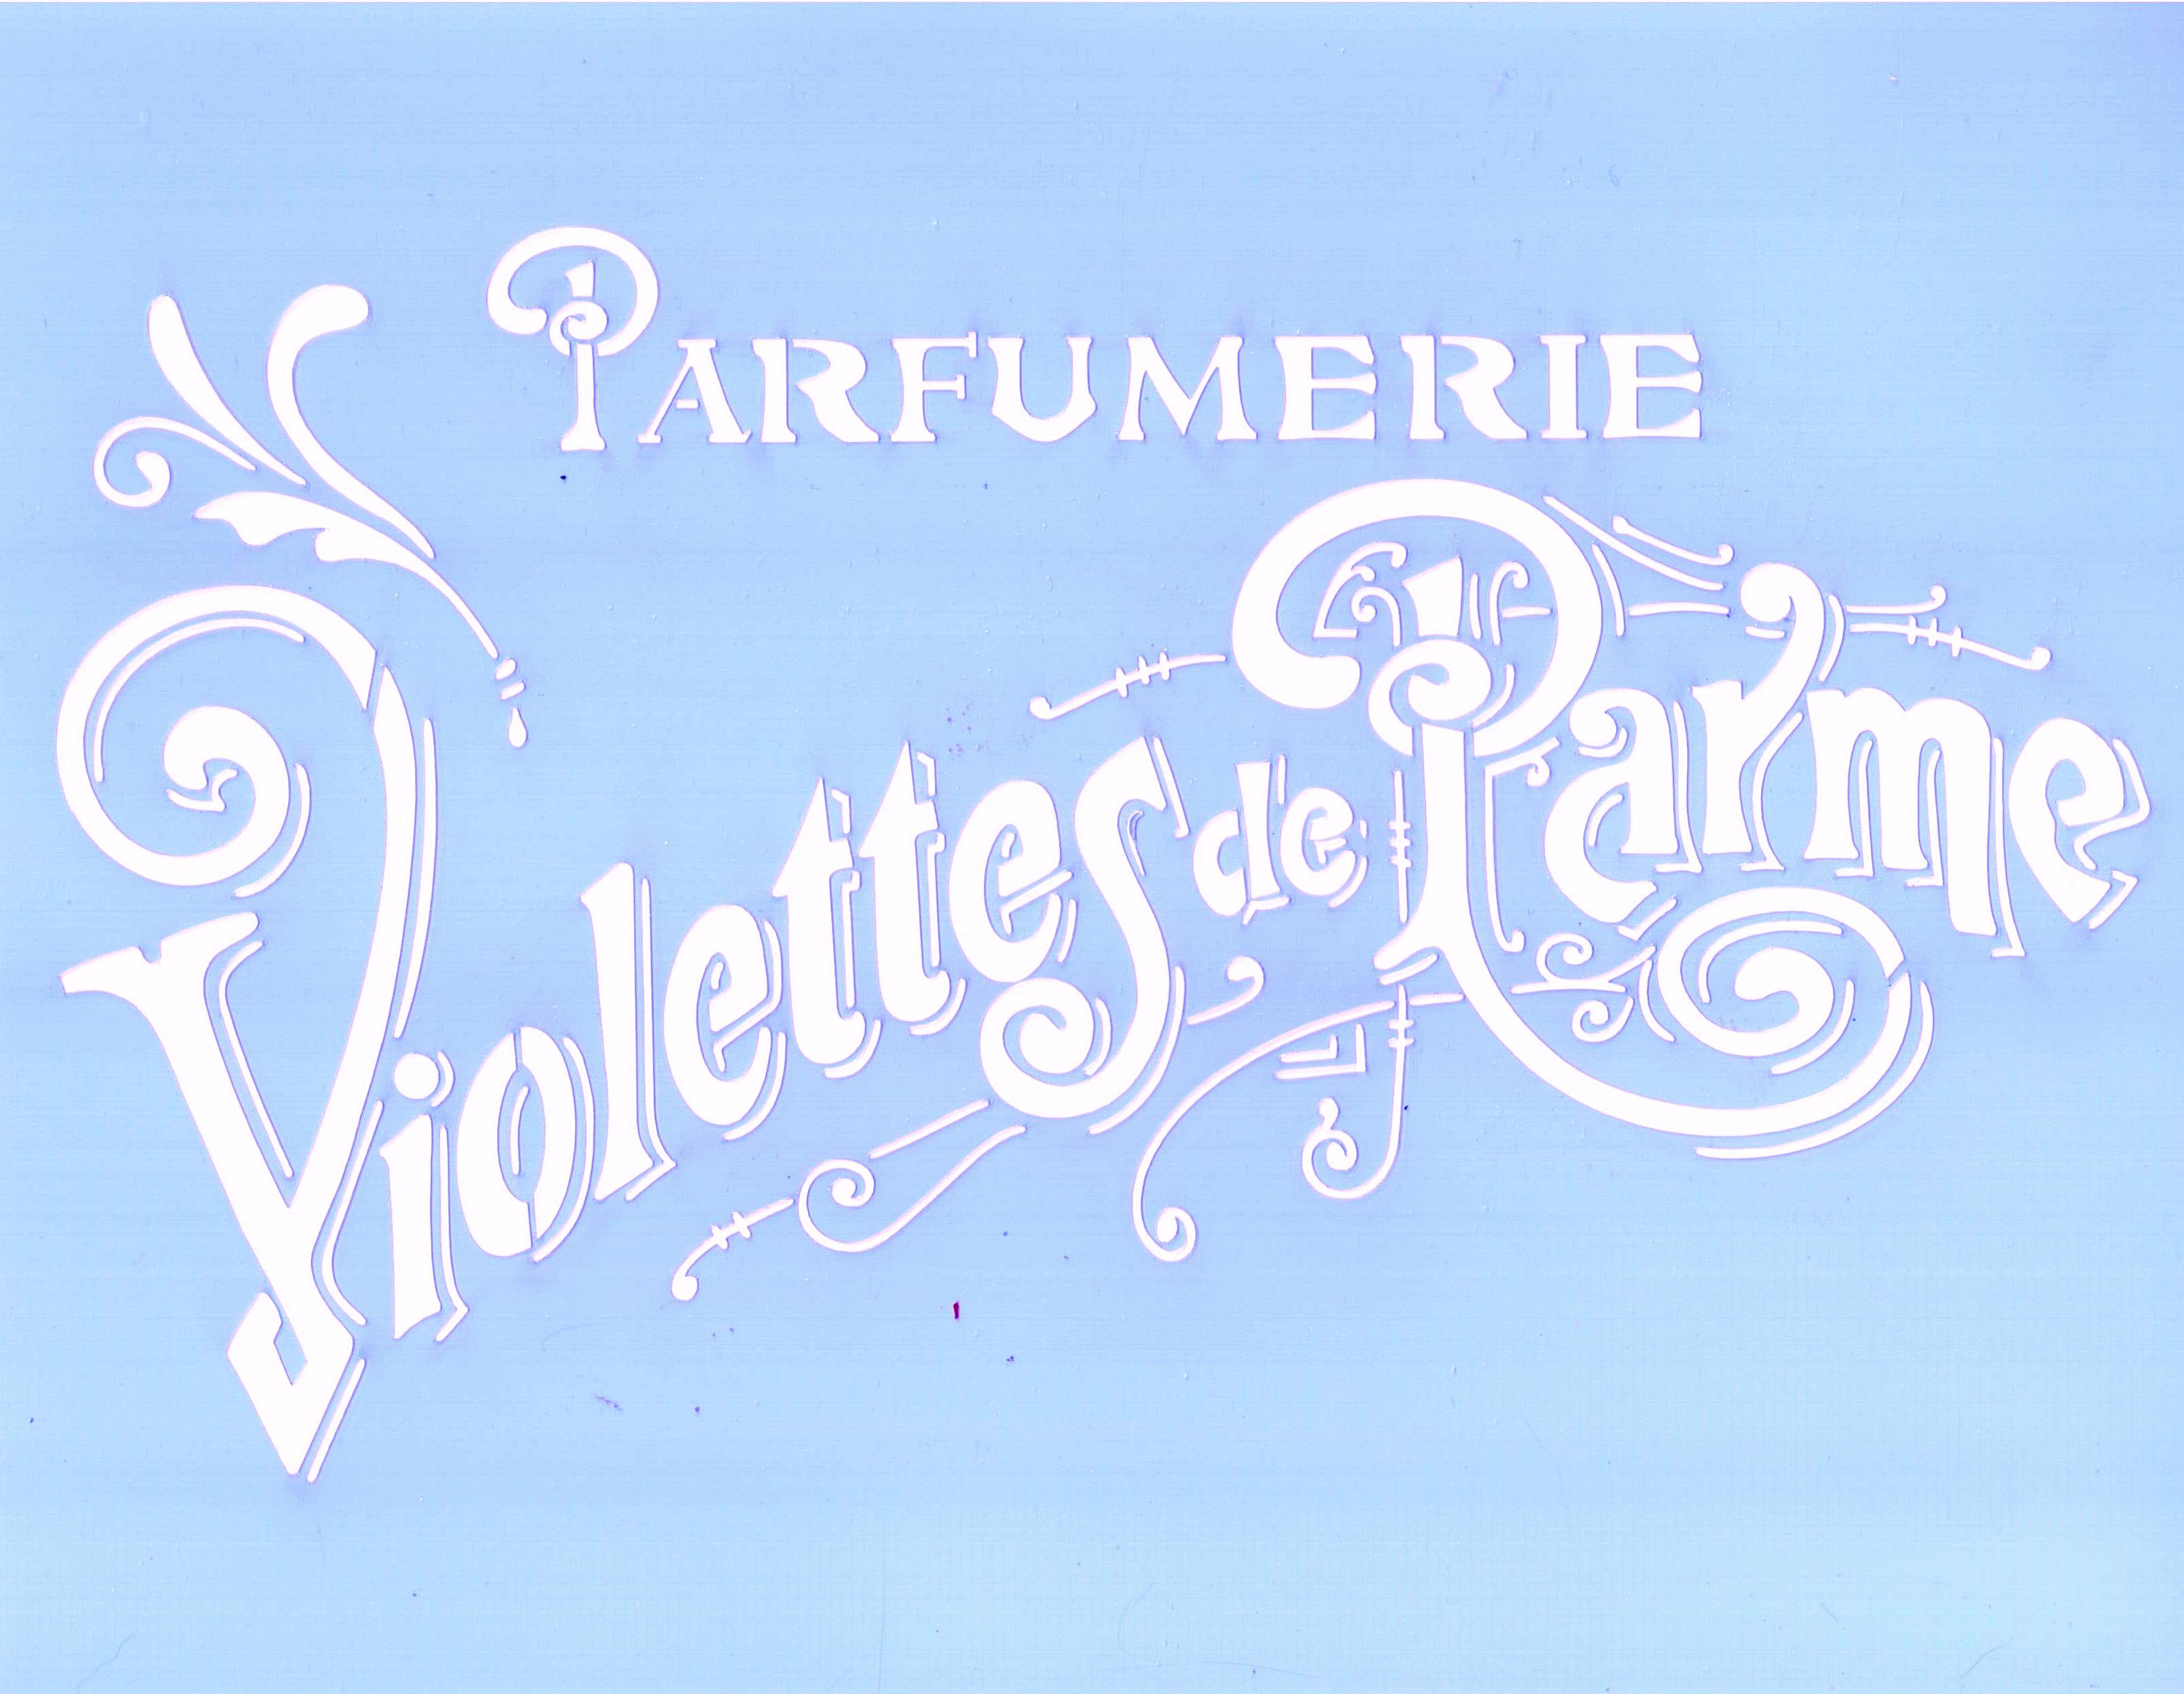 tm-parfumerie-st-207.jpg